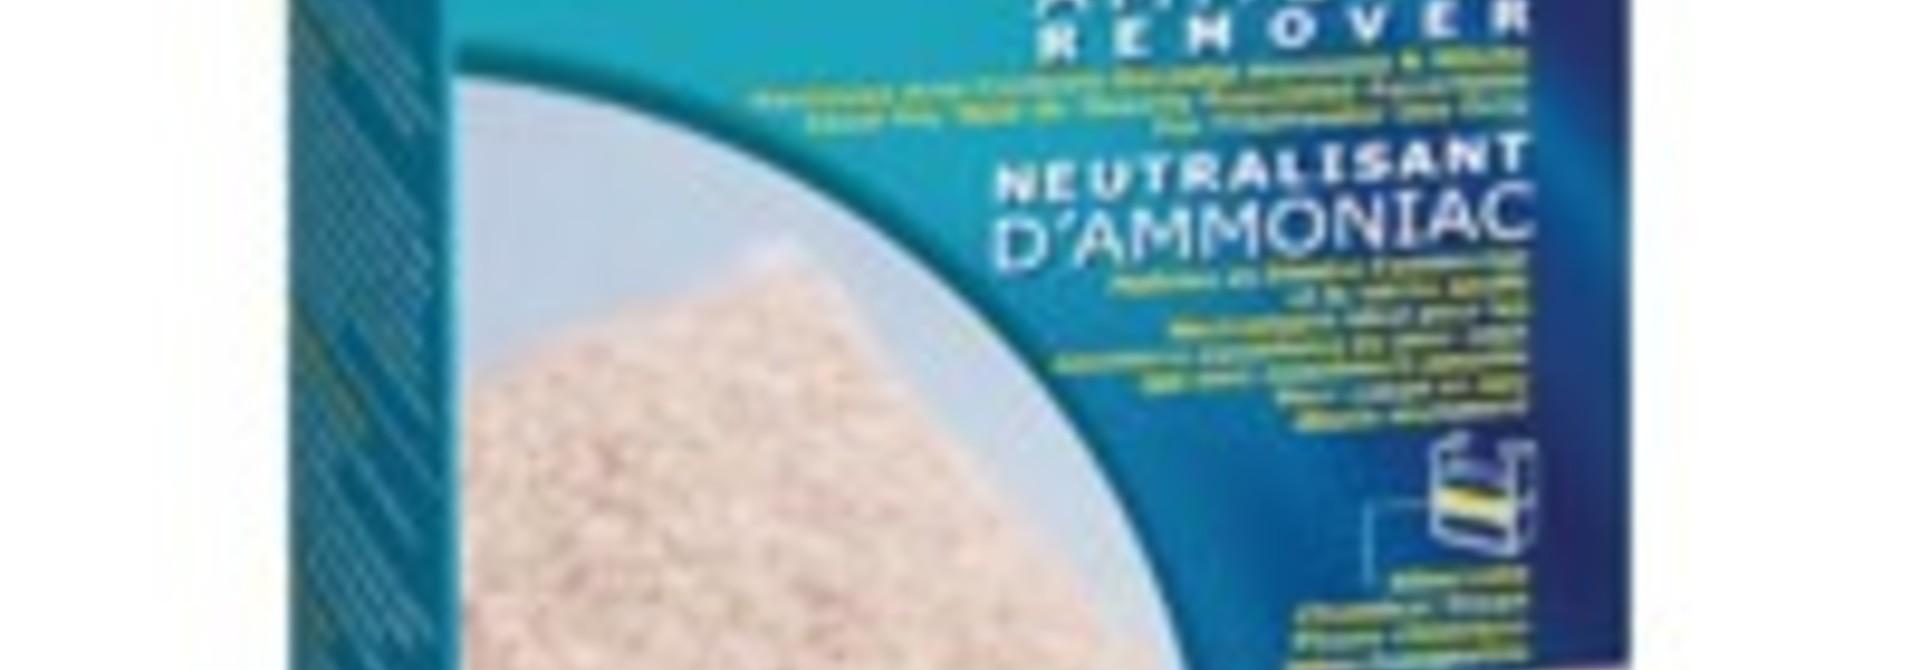 AquaClear 20 Ammonia Remover Filter Insert - 66 g (2.3 oz)